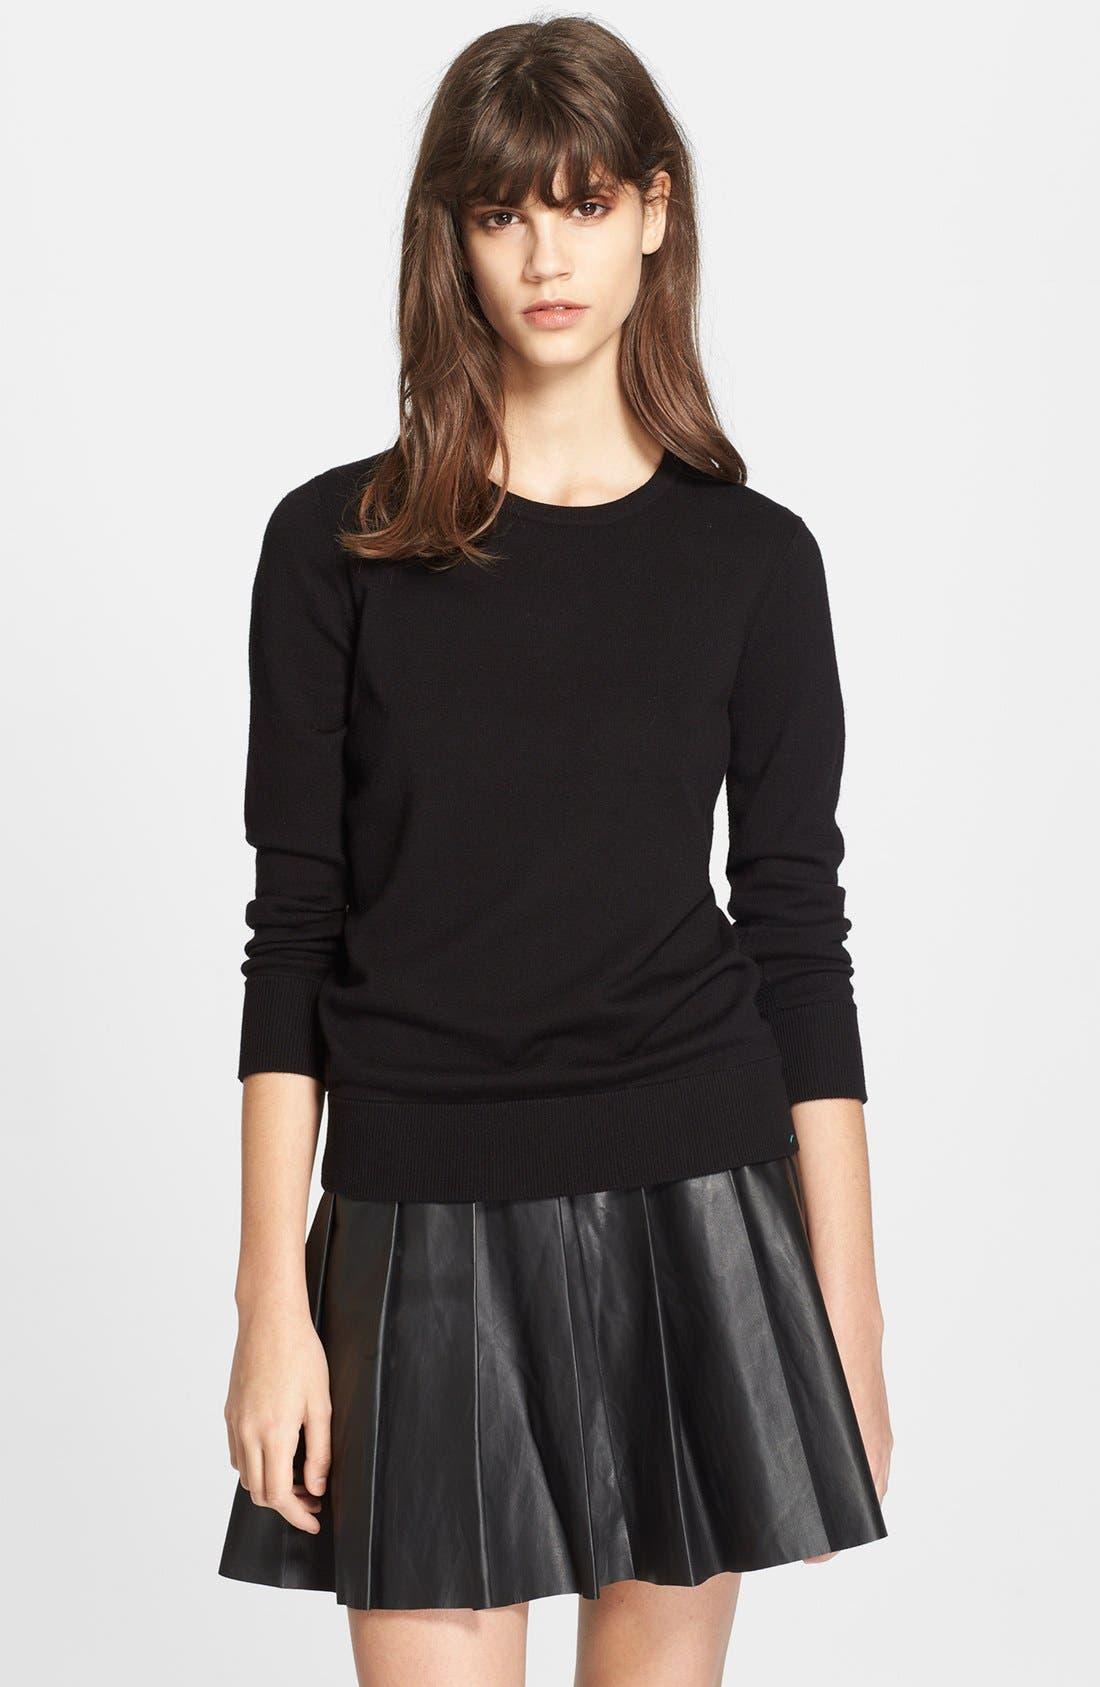 Alternate Image 1 Selected - rag & bone 'Casey' Sweater